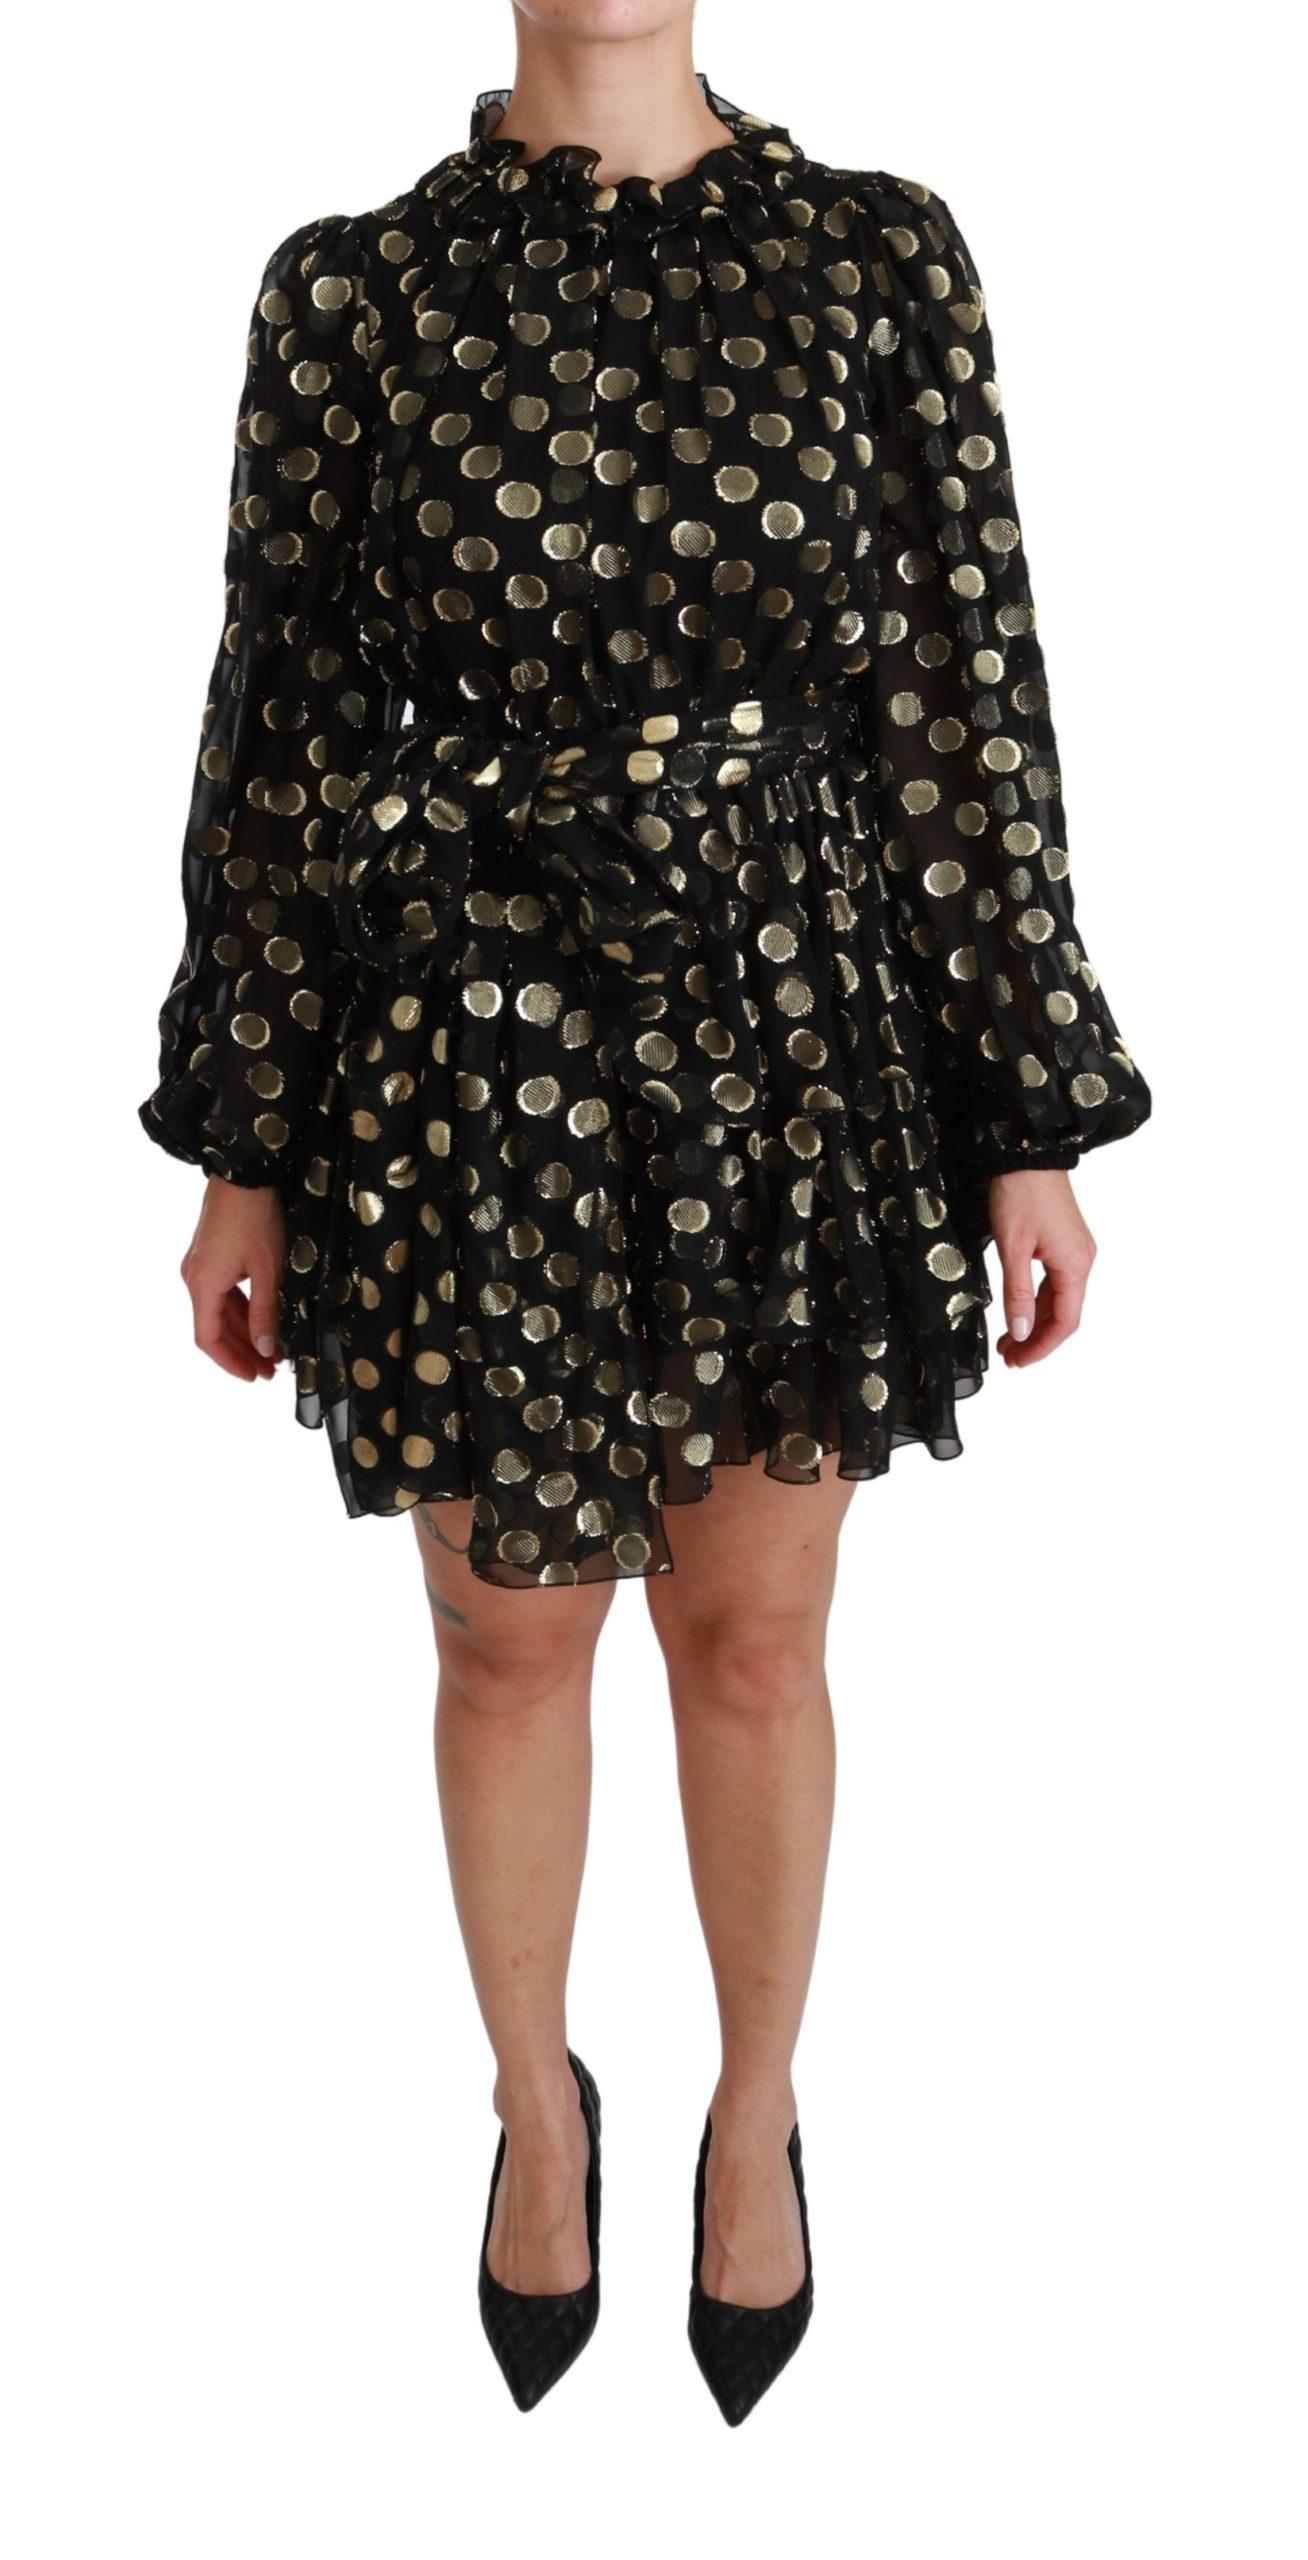 Dolce & Gabbana Women's Lurex Polka Silk Flared Dress Gold Black DR2492 - IT36 | XS